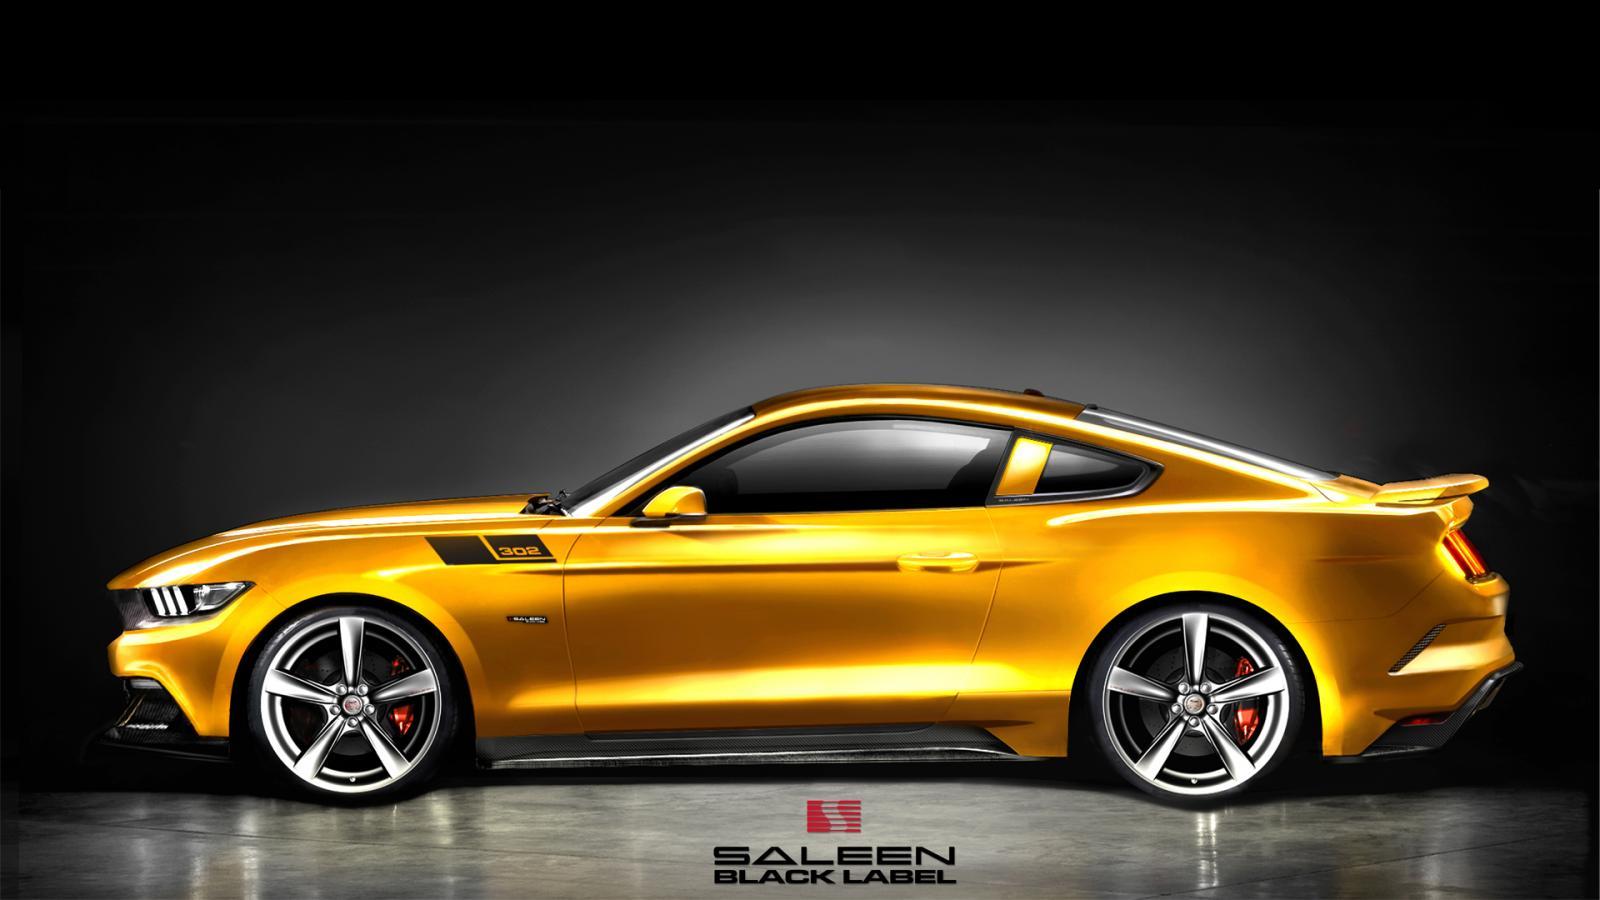 2015 Saleen S302 Mustang Specs Revealed, Order Books Opened